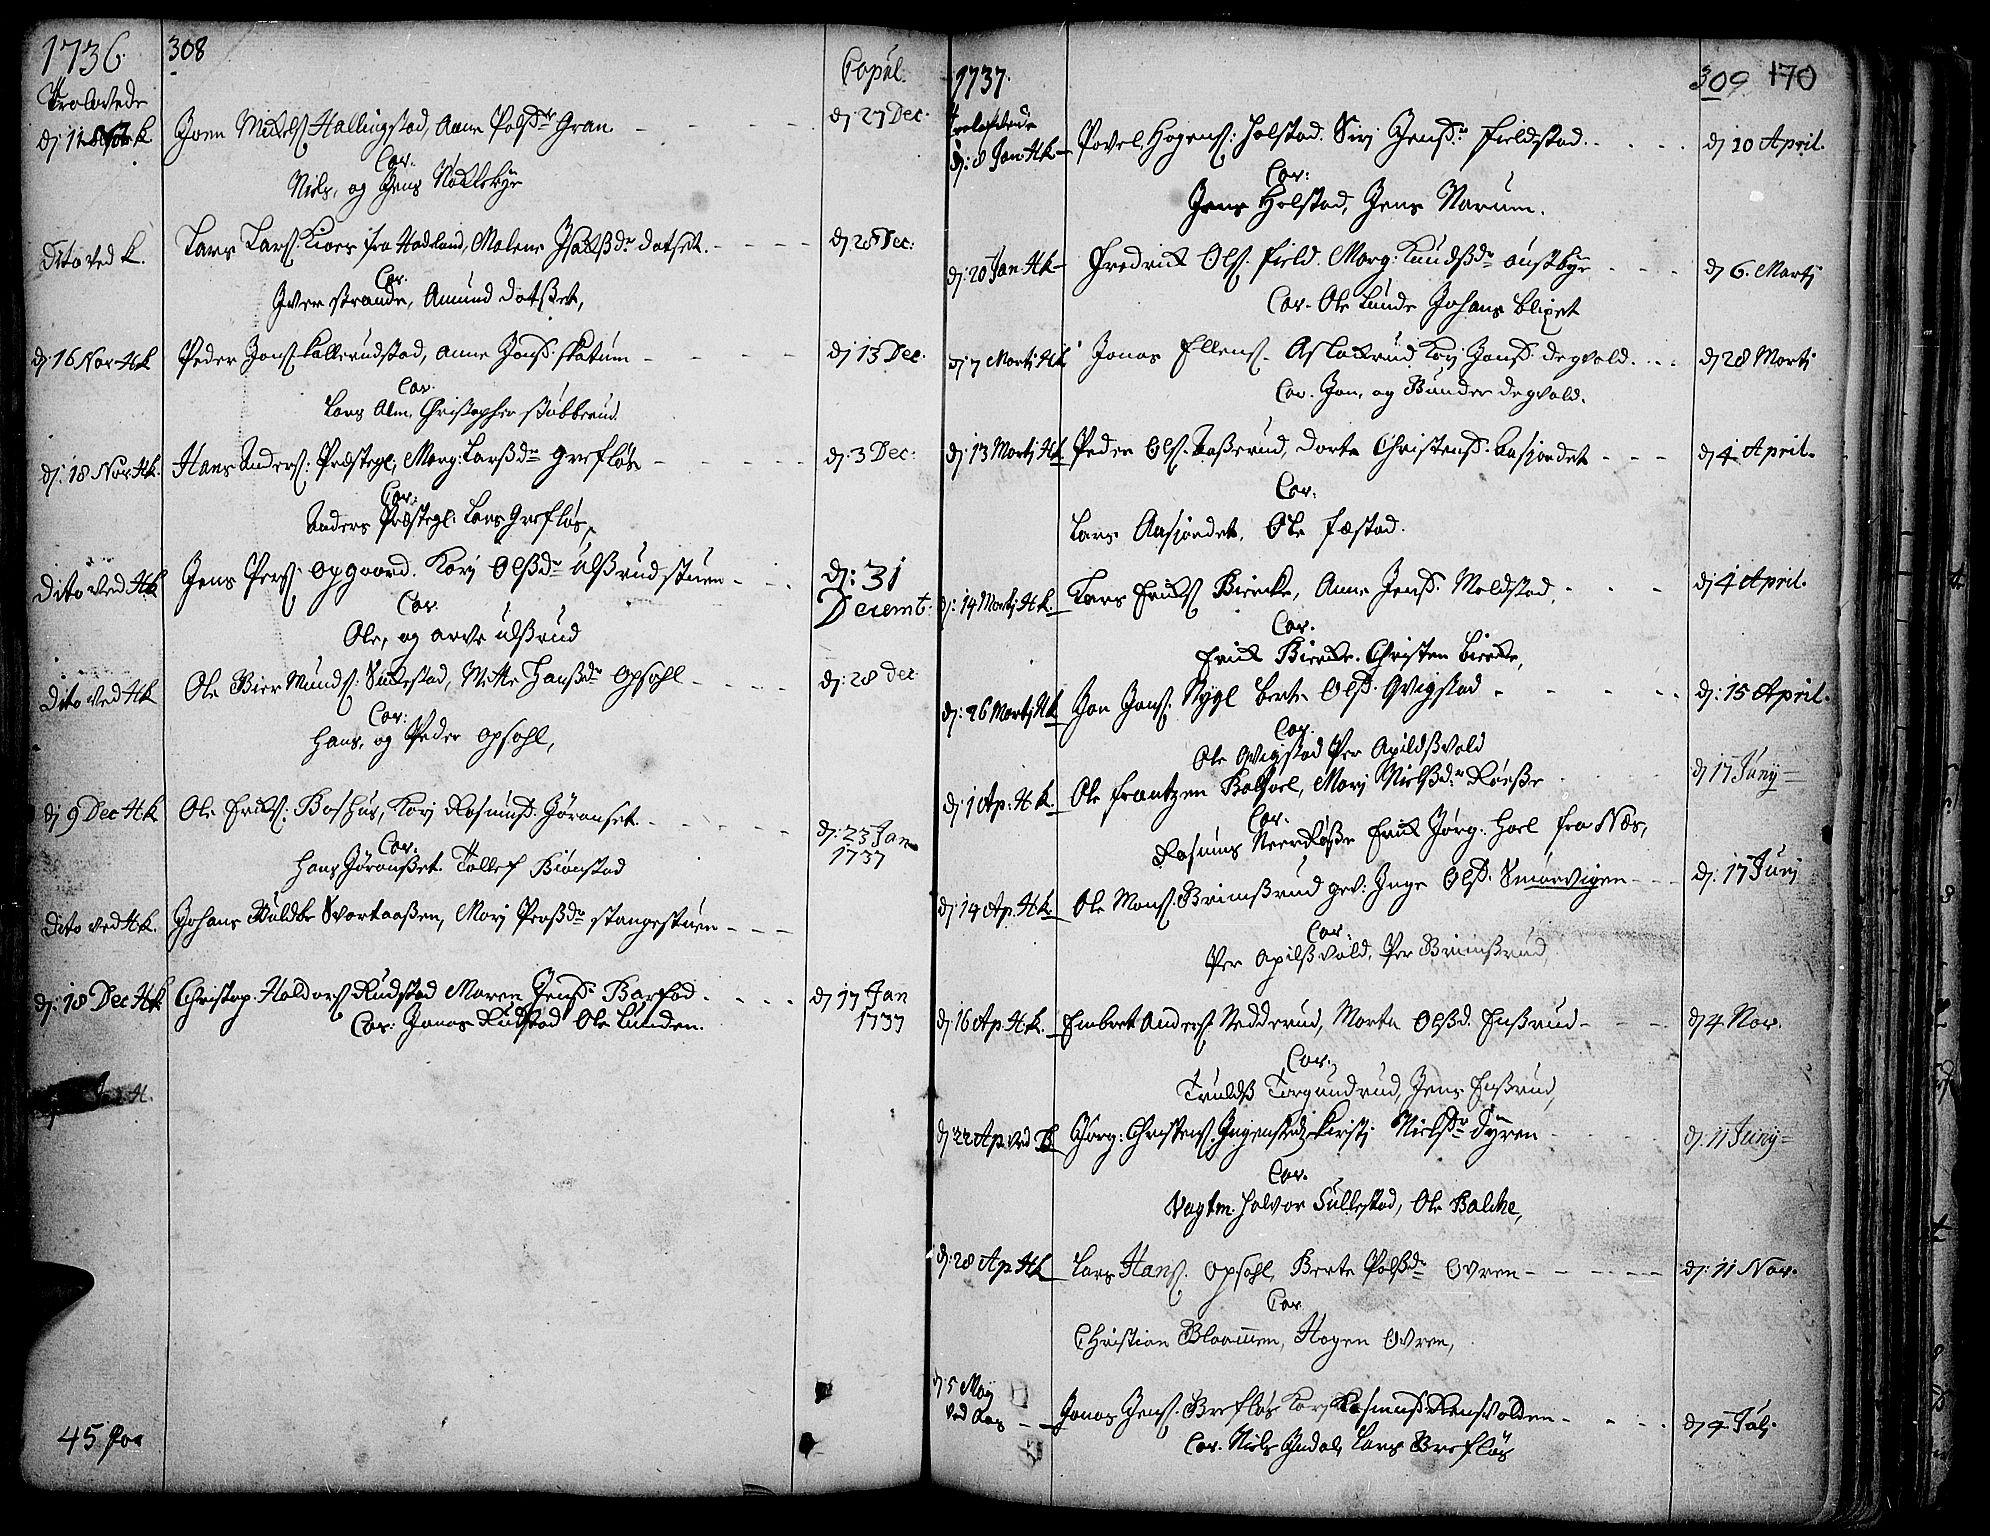 SAH, Toten prestekontor, Ministerialbok nr. 3, 1734-1751, s. 308-309